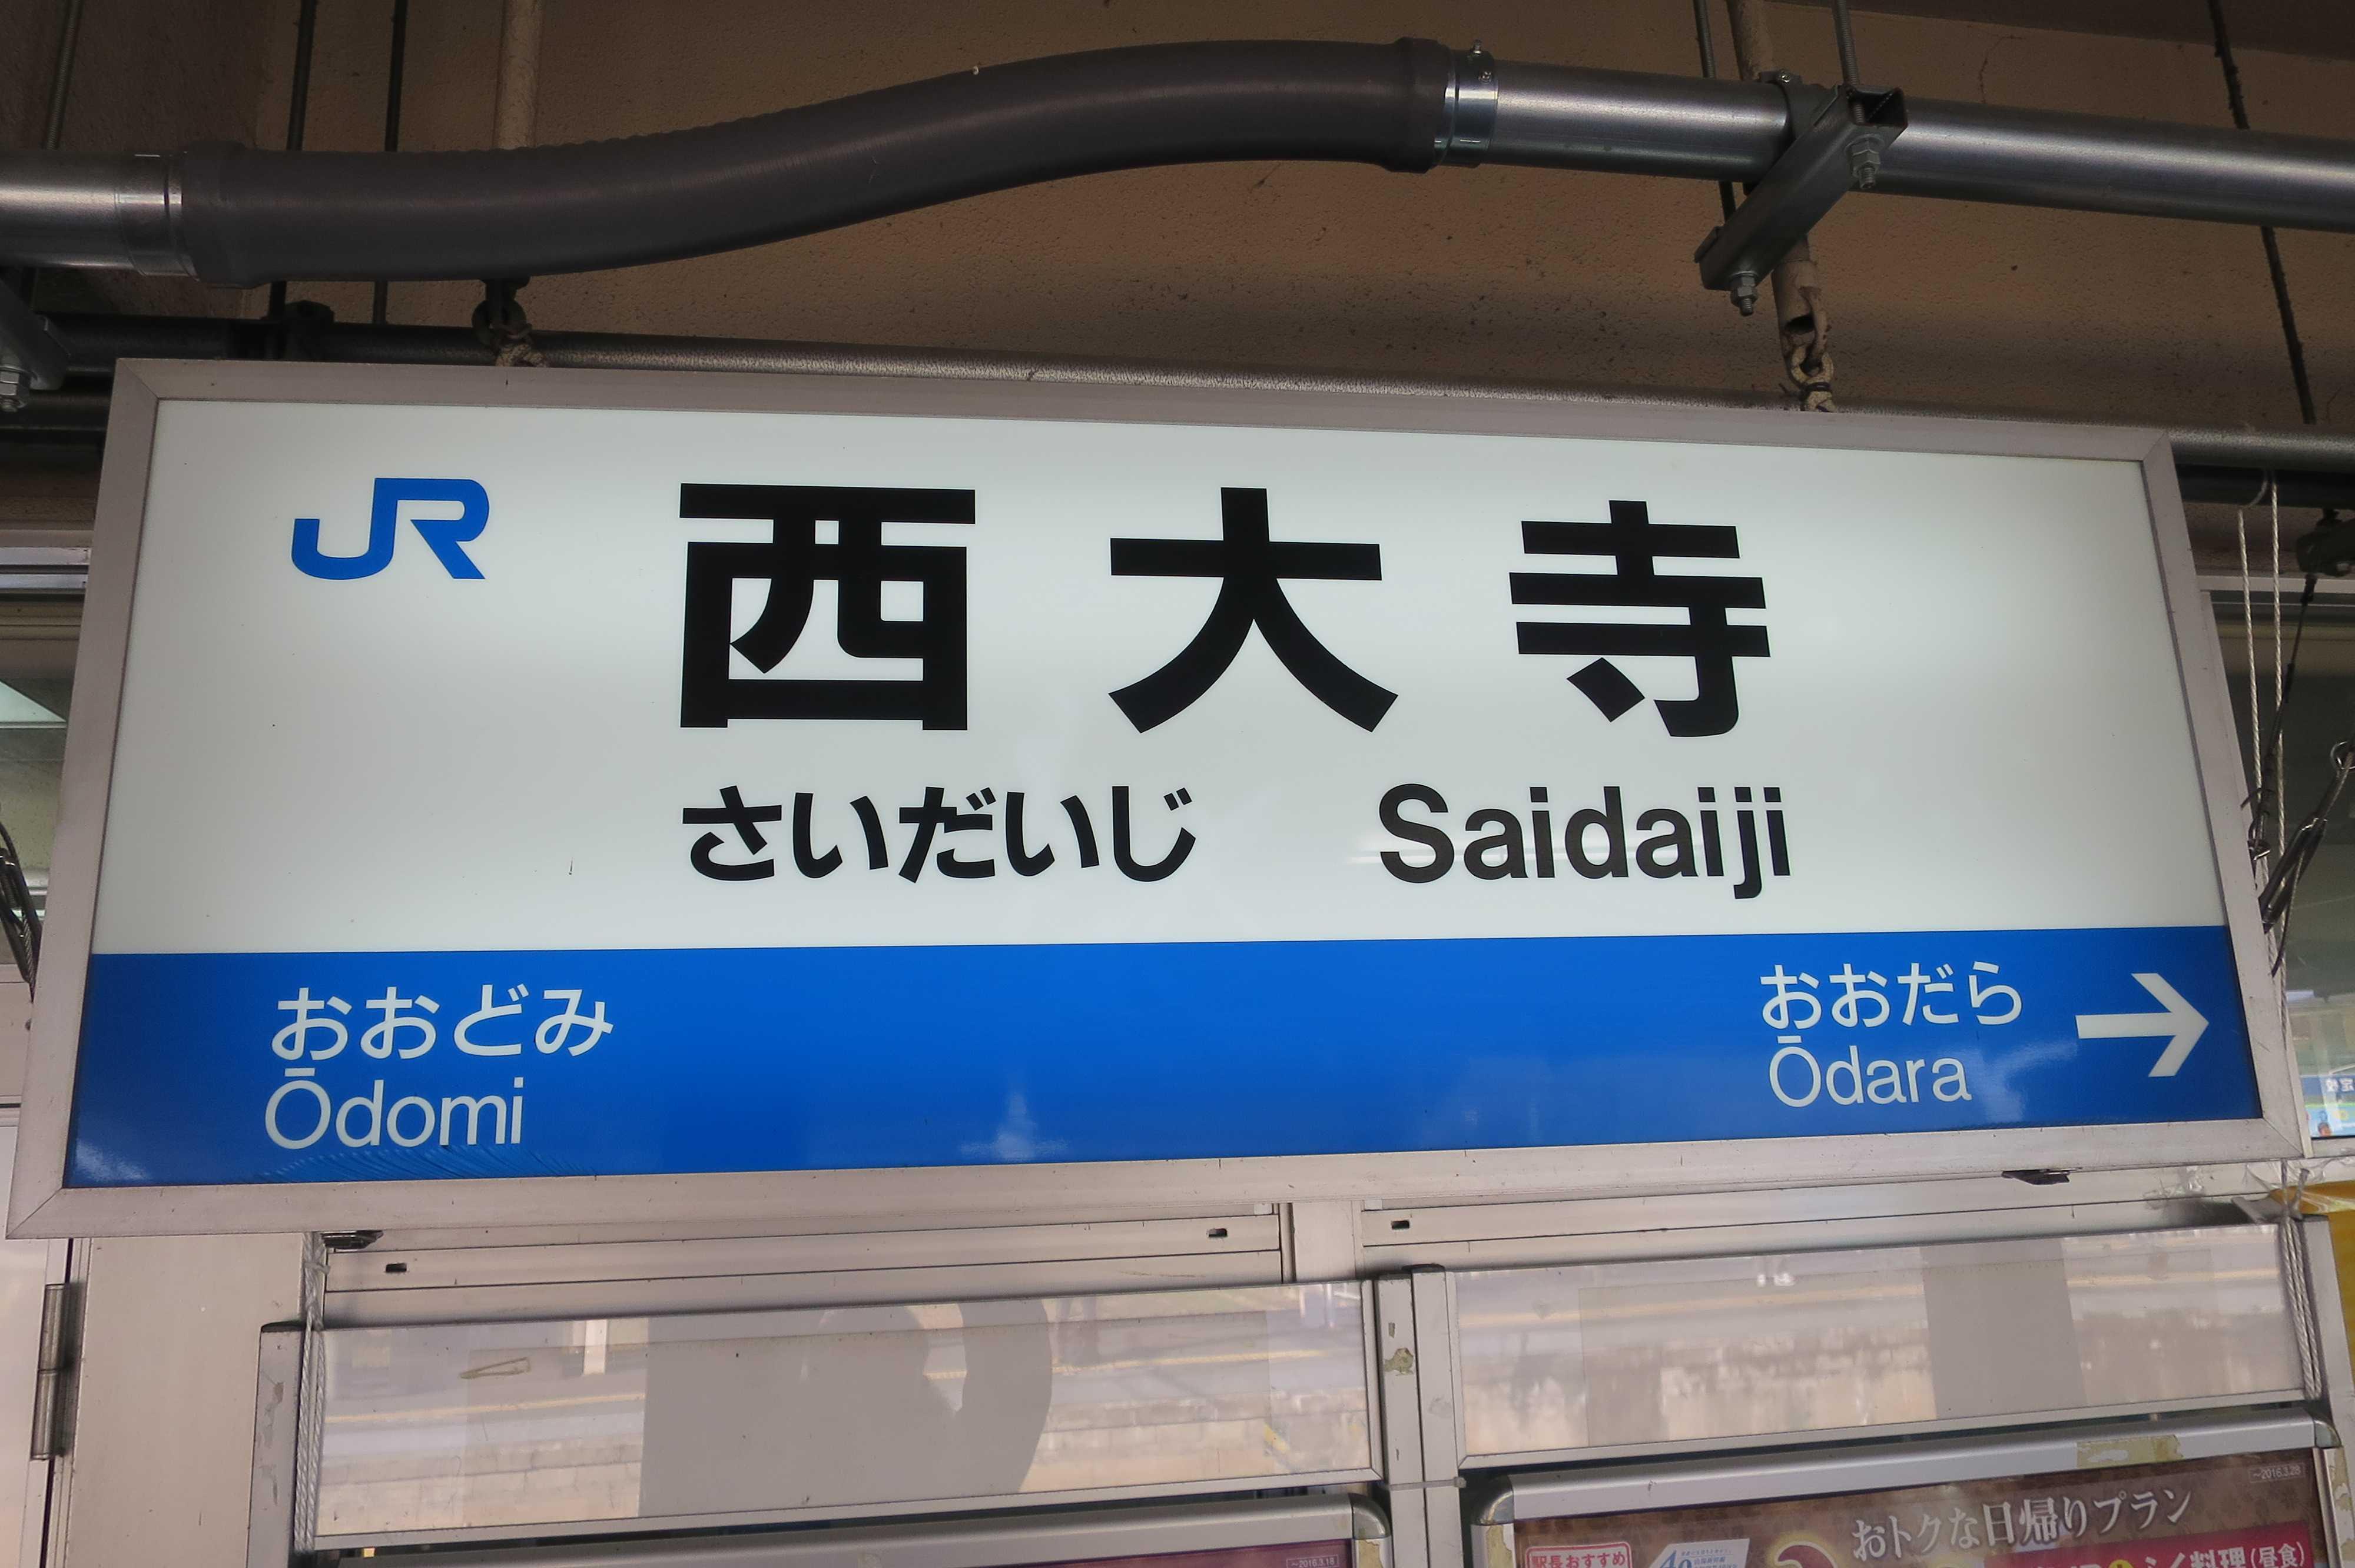 JR西大寺駅